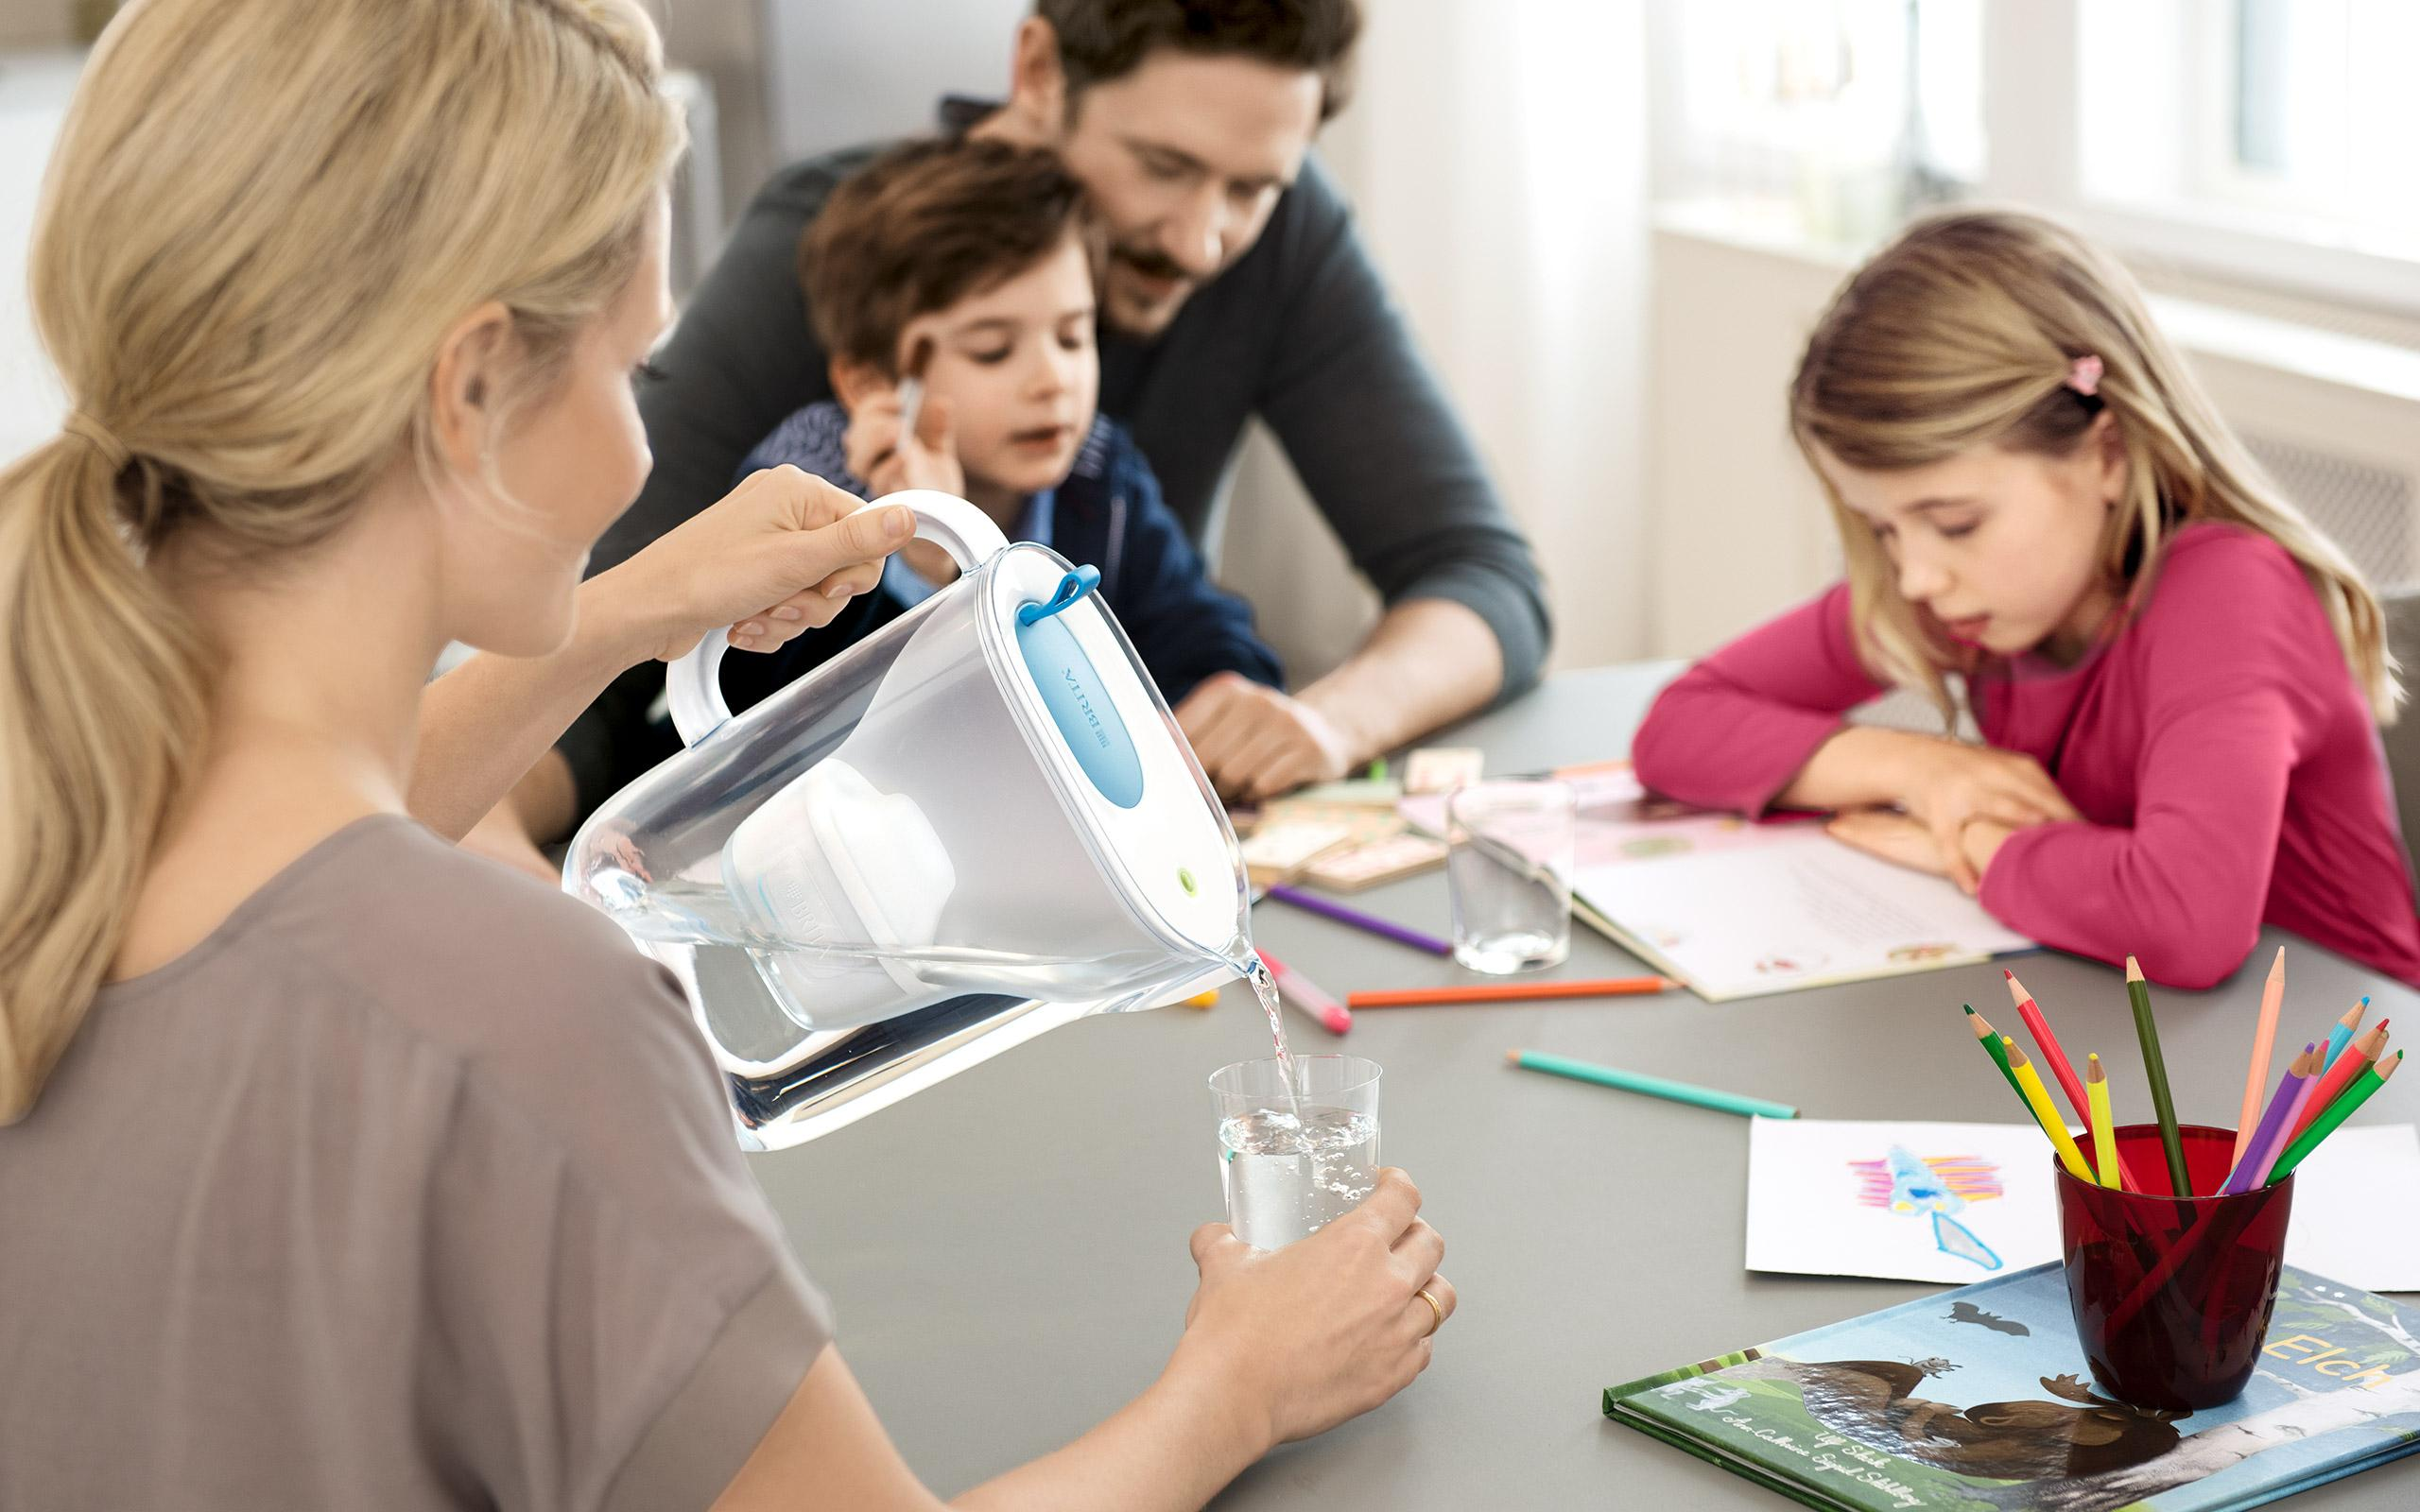 BRITA fill&enjoy Style soft blue family kitchen